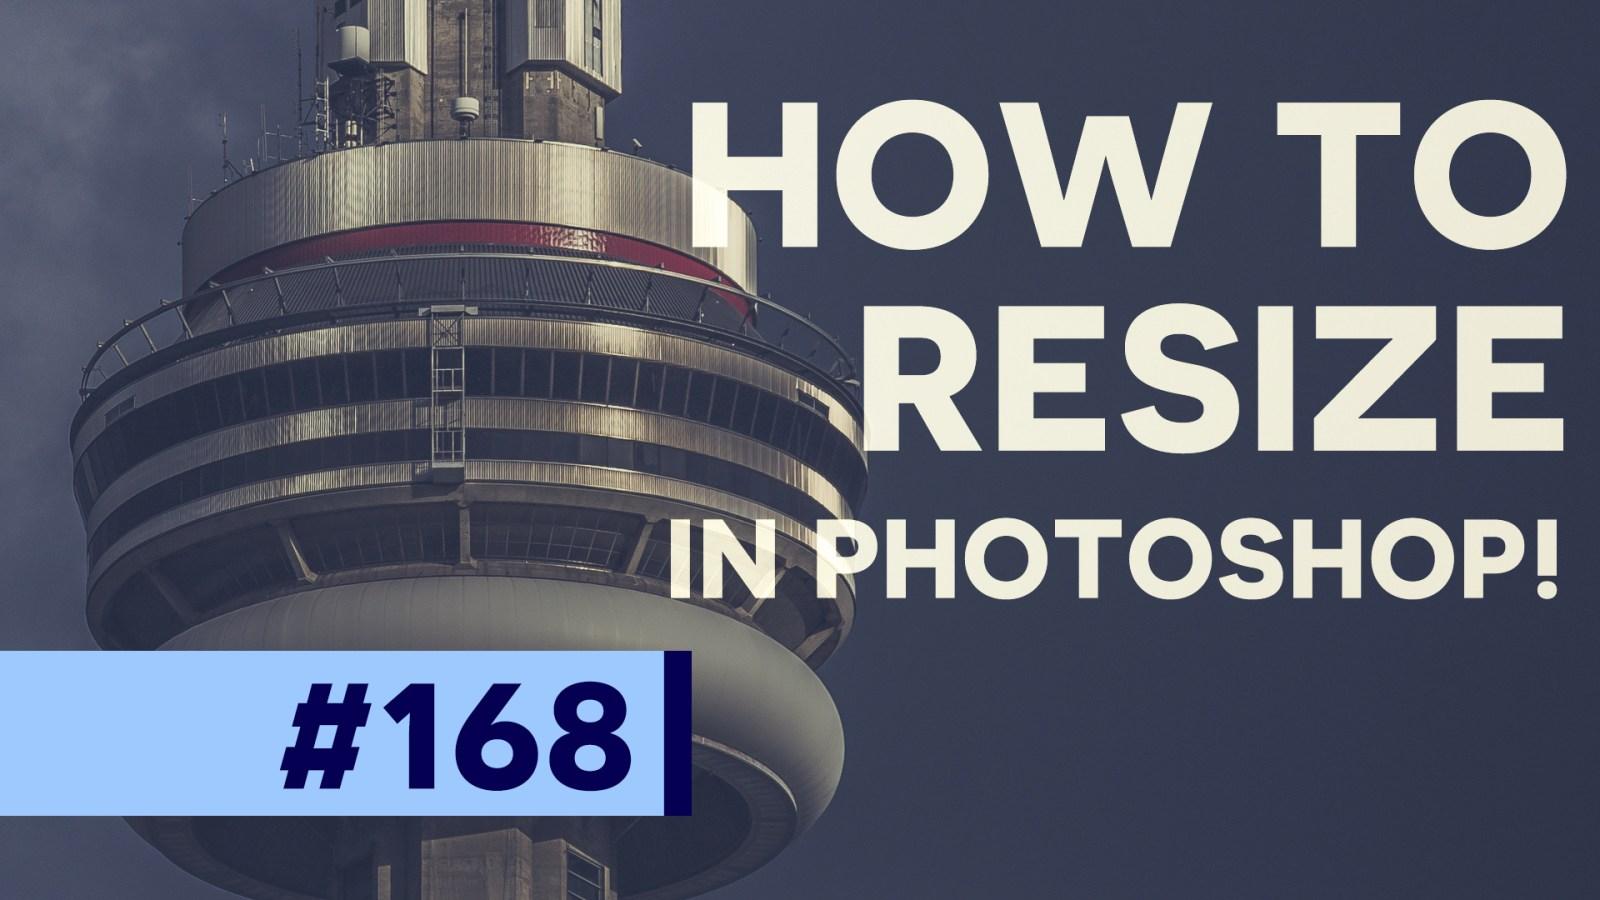 how-to-resize-photos-photoshop